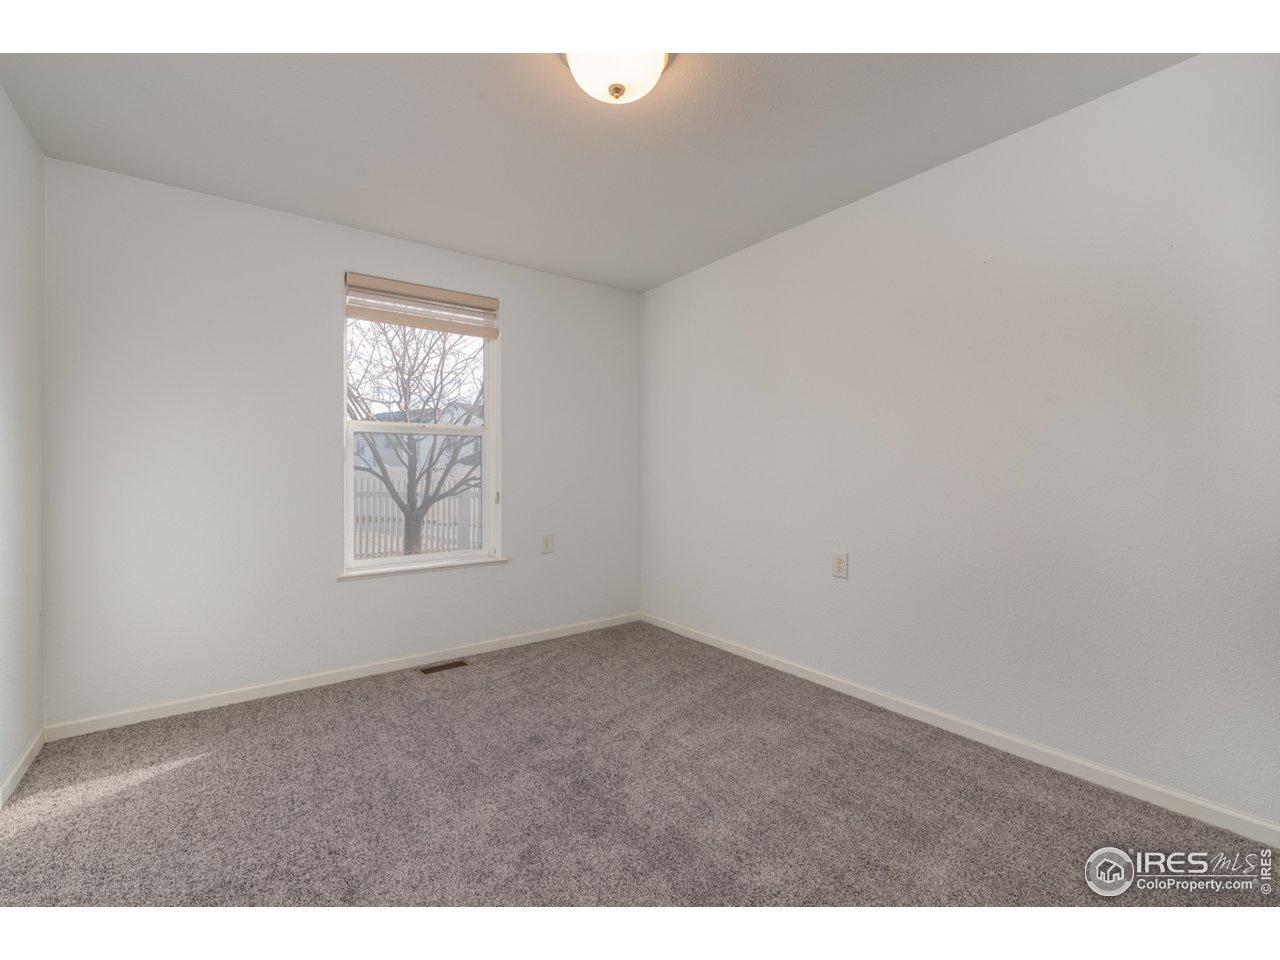 3rd NON CONFORMING (No Closet) bedroom/Den/Office